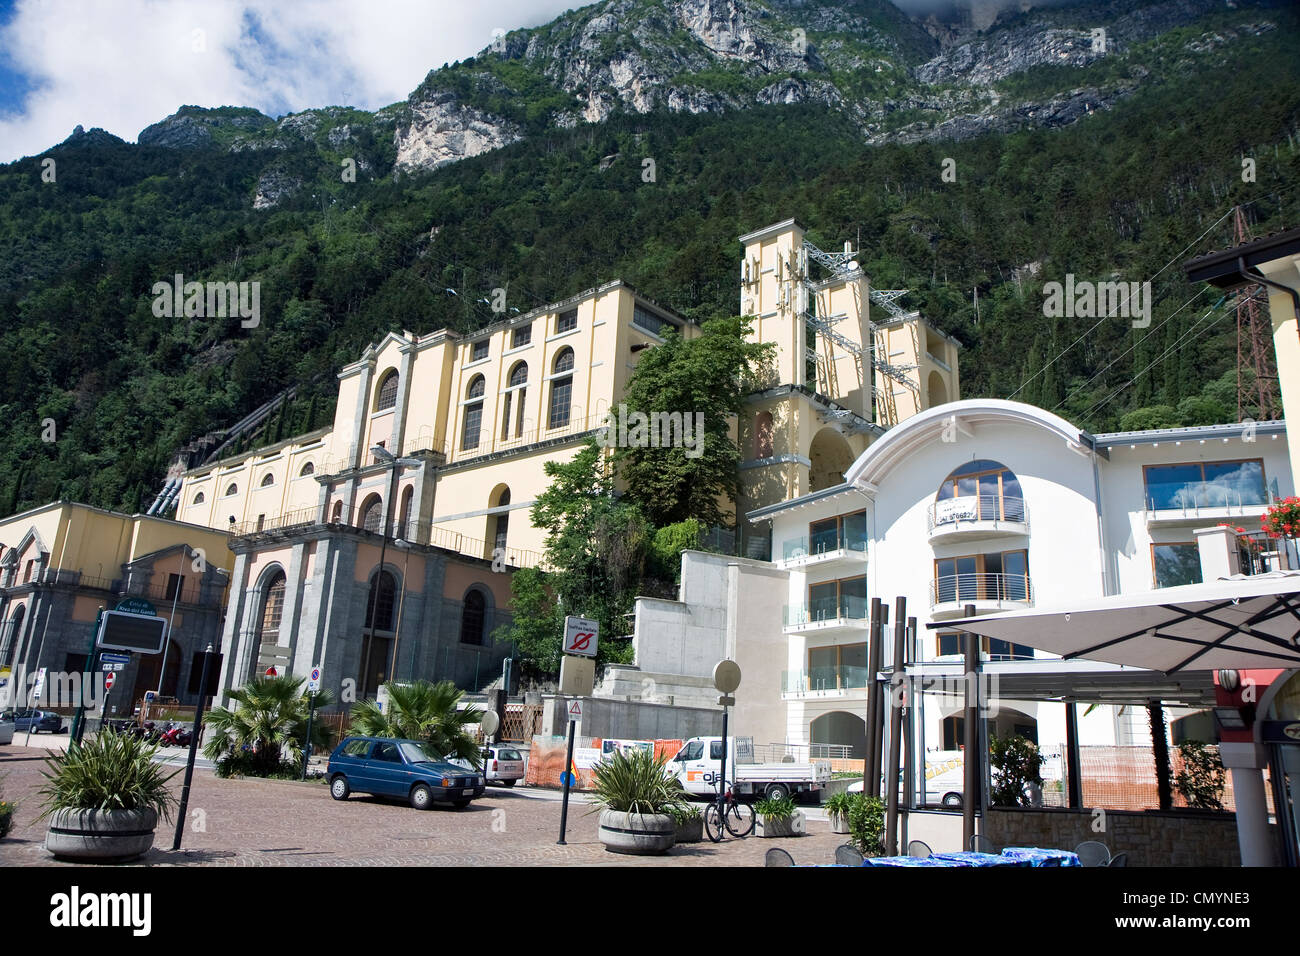 Riva del Garda town in the northern Italy mountains on Garda lake Stock Photo